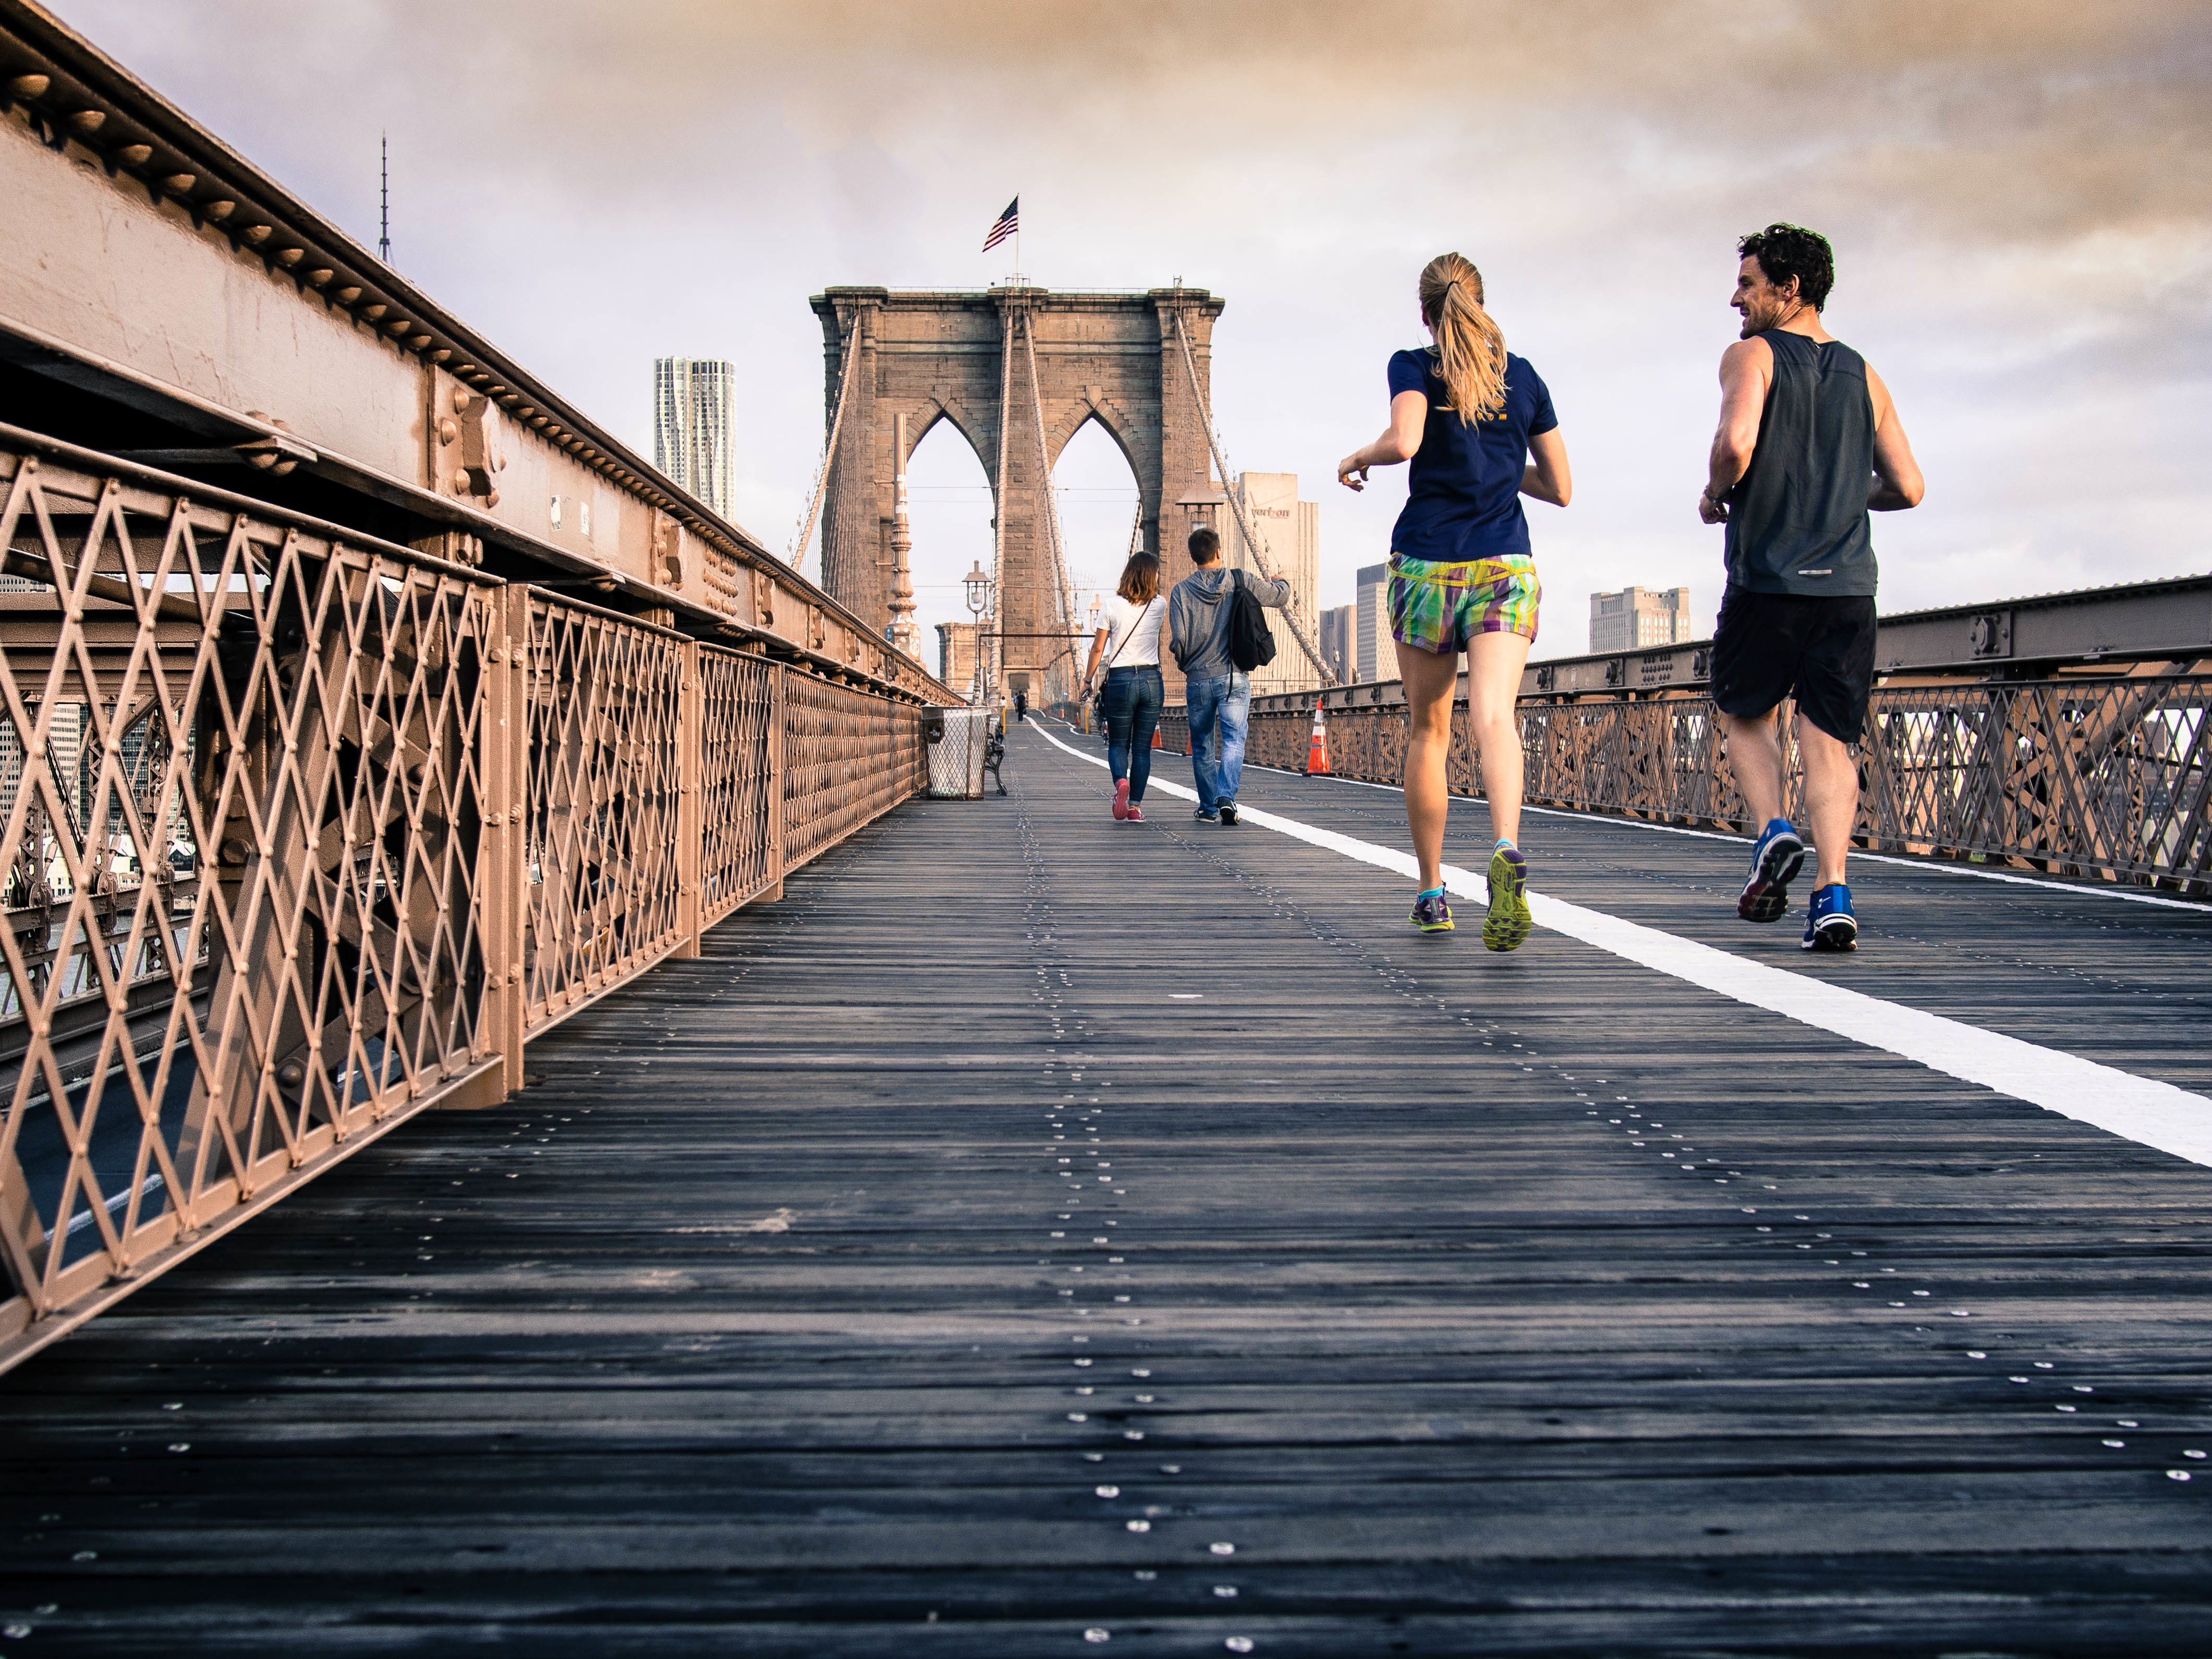 runners_bridge.jpg